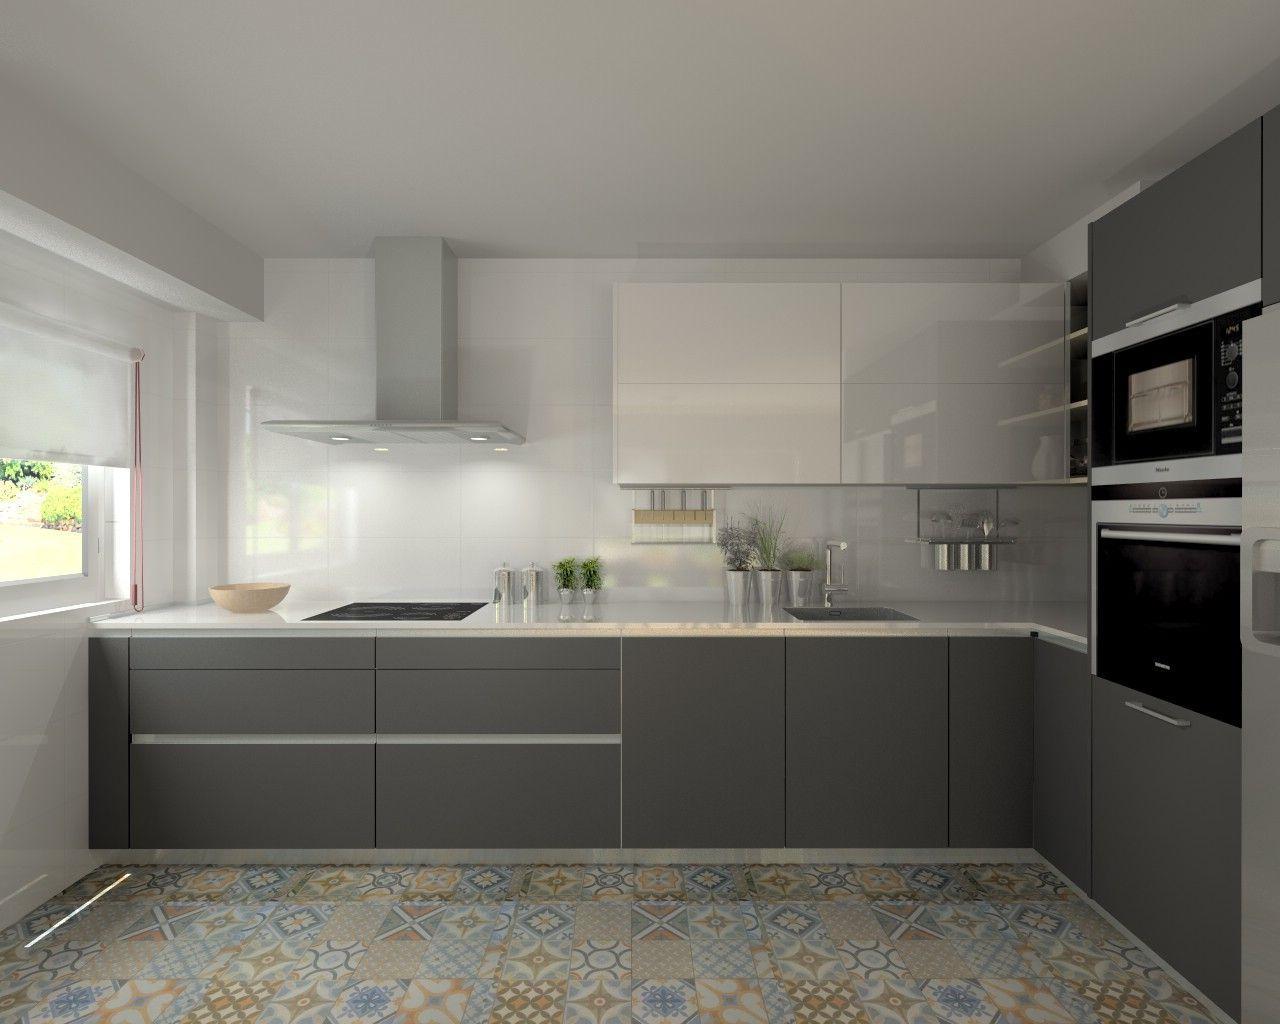 Modelo Line E Gris Y L Blanco Encimera Silestone Cocina Kitchen Interior Design Modern Kitchen Furniture Design Kitchen Decor